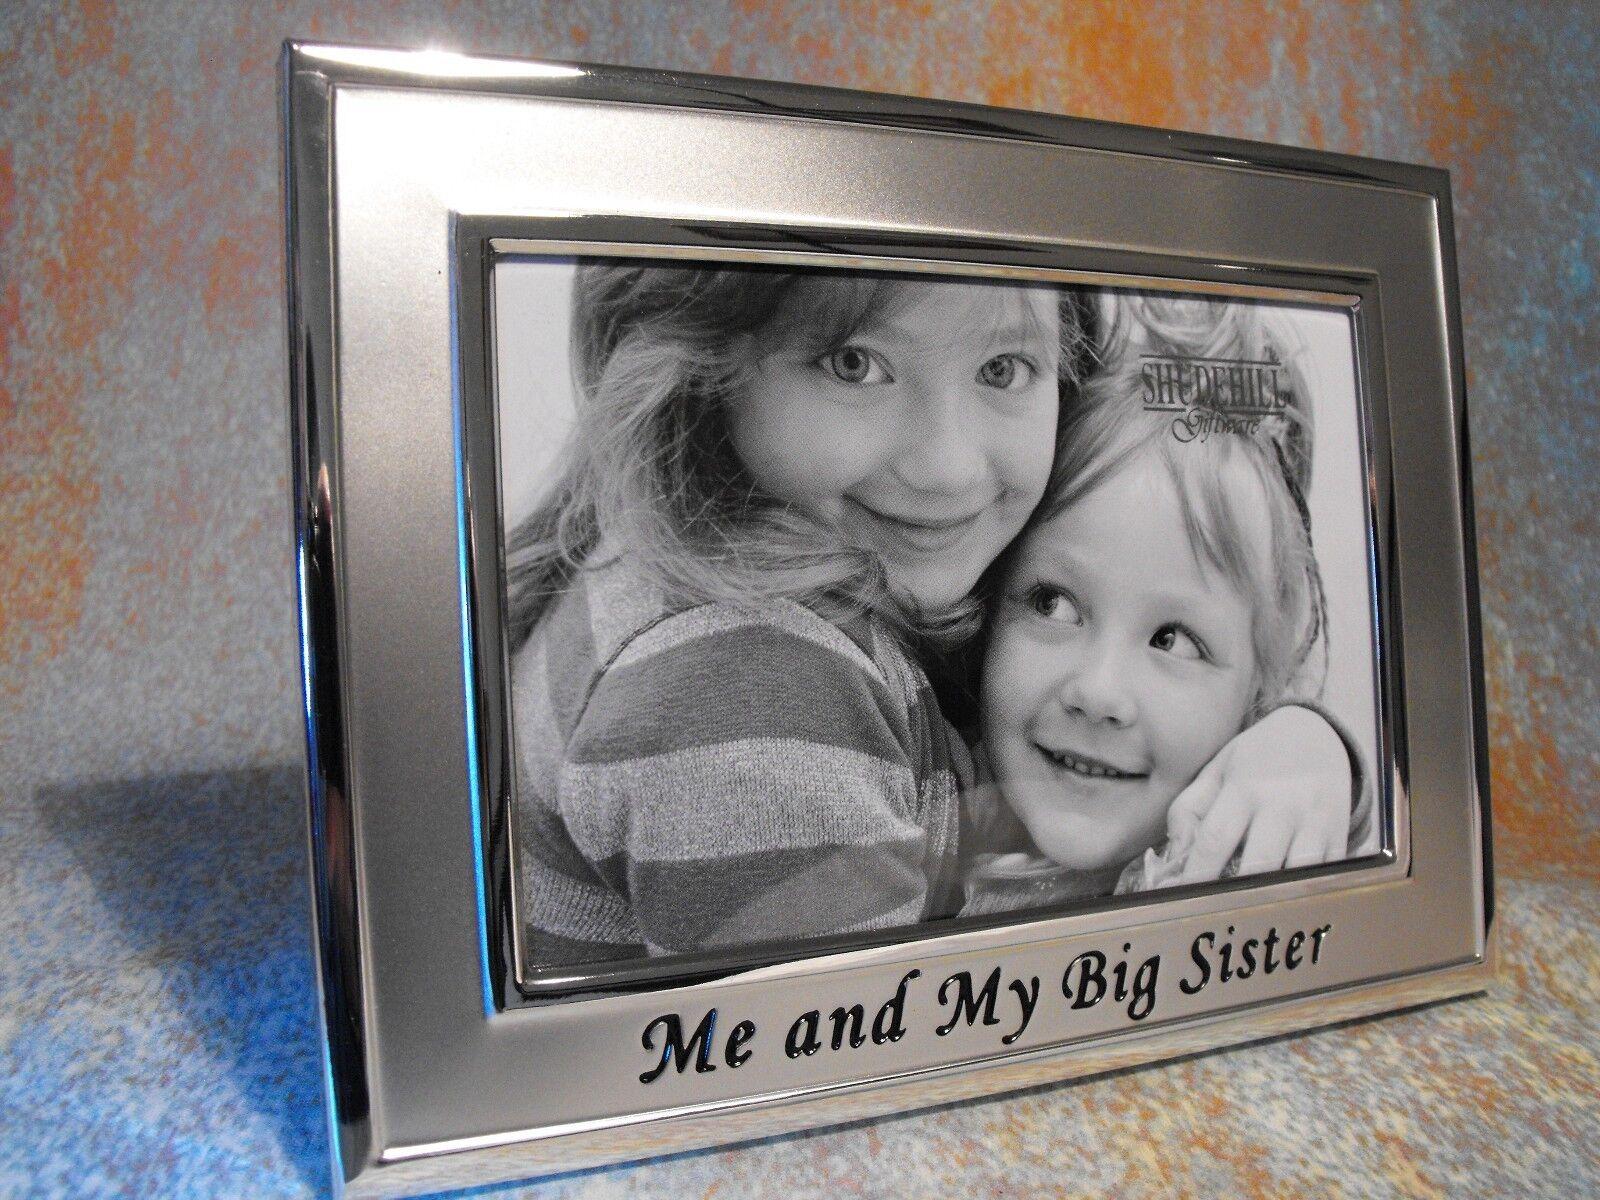 SISTERS PHOTO FRAME SISTER BROTHER PHOTO FRAME # BIG SISTER PHOTO ...